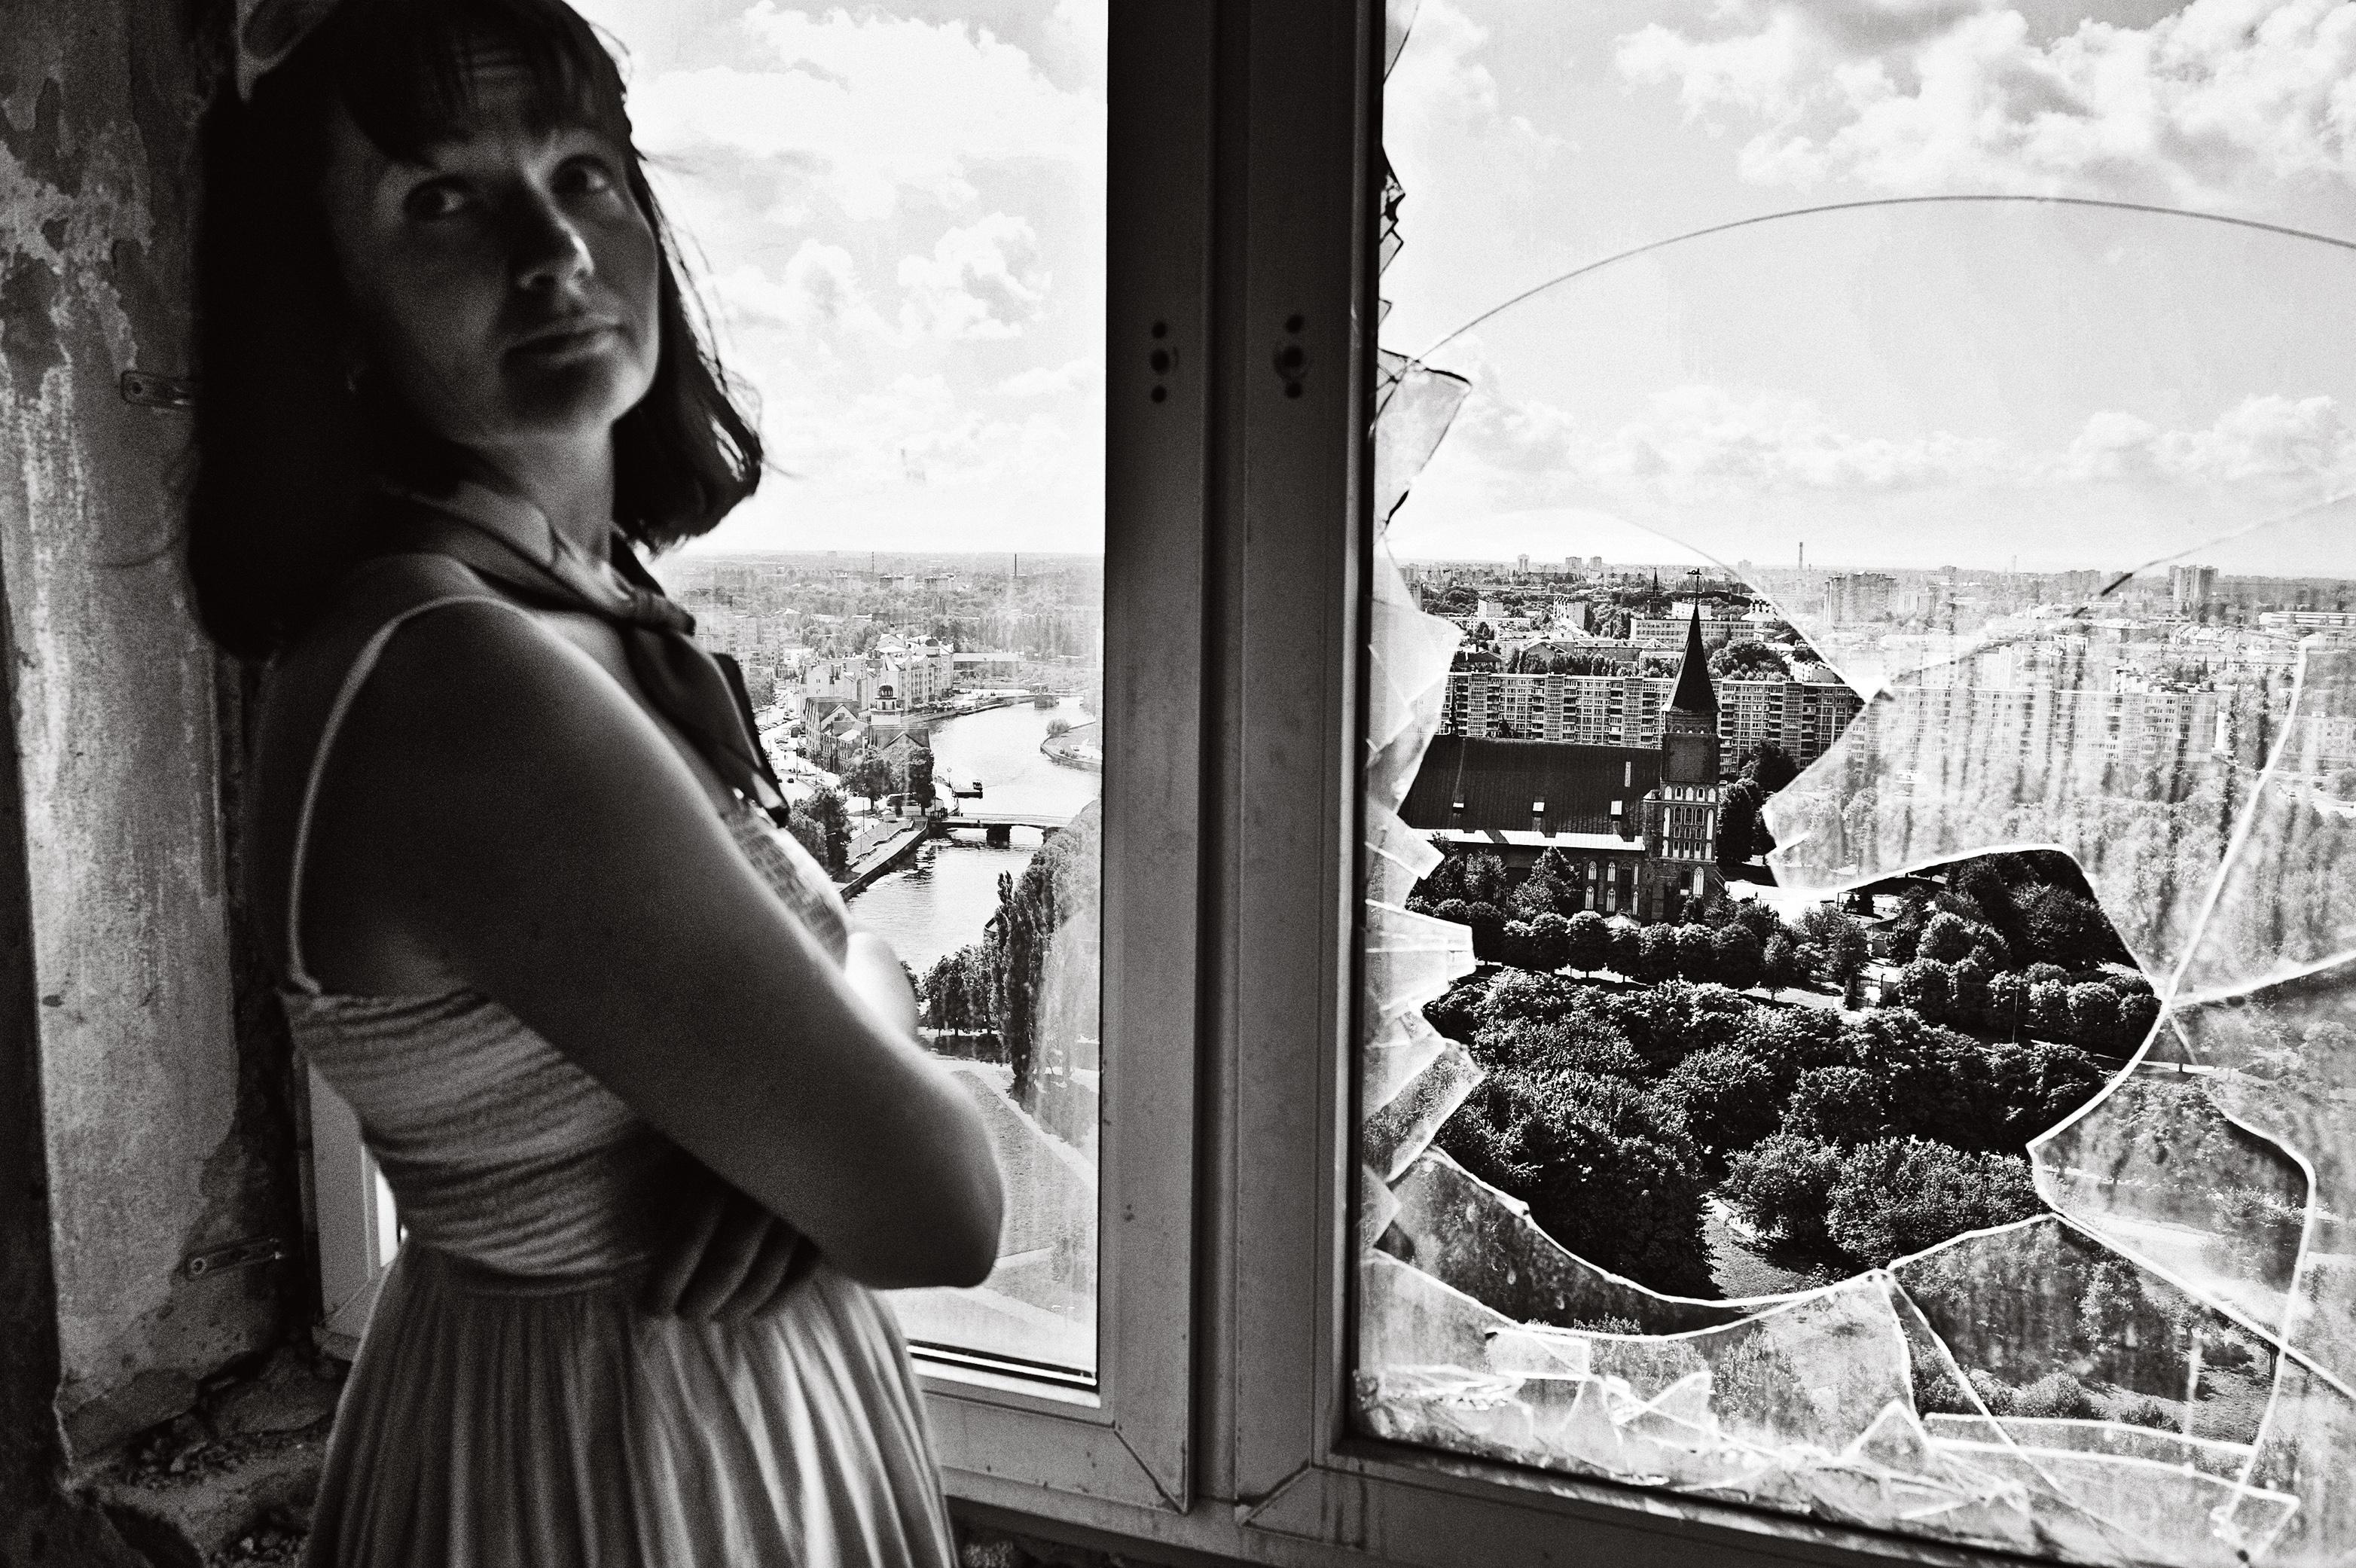 04 - © Dmitri Leltschuk - Editions Noir sur Blanc